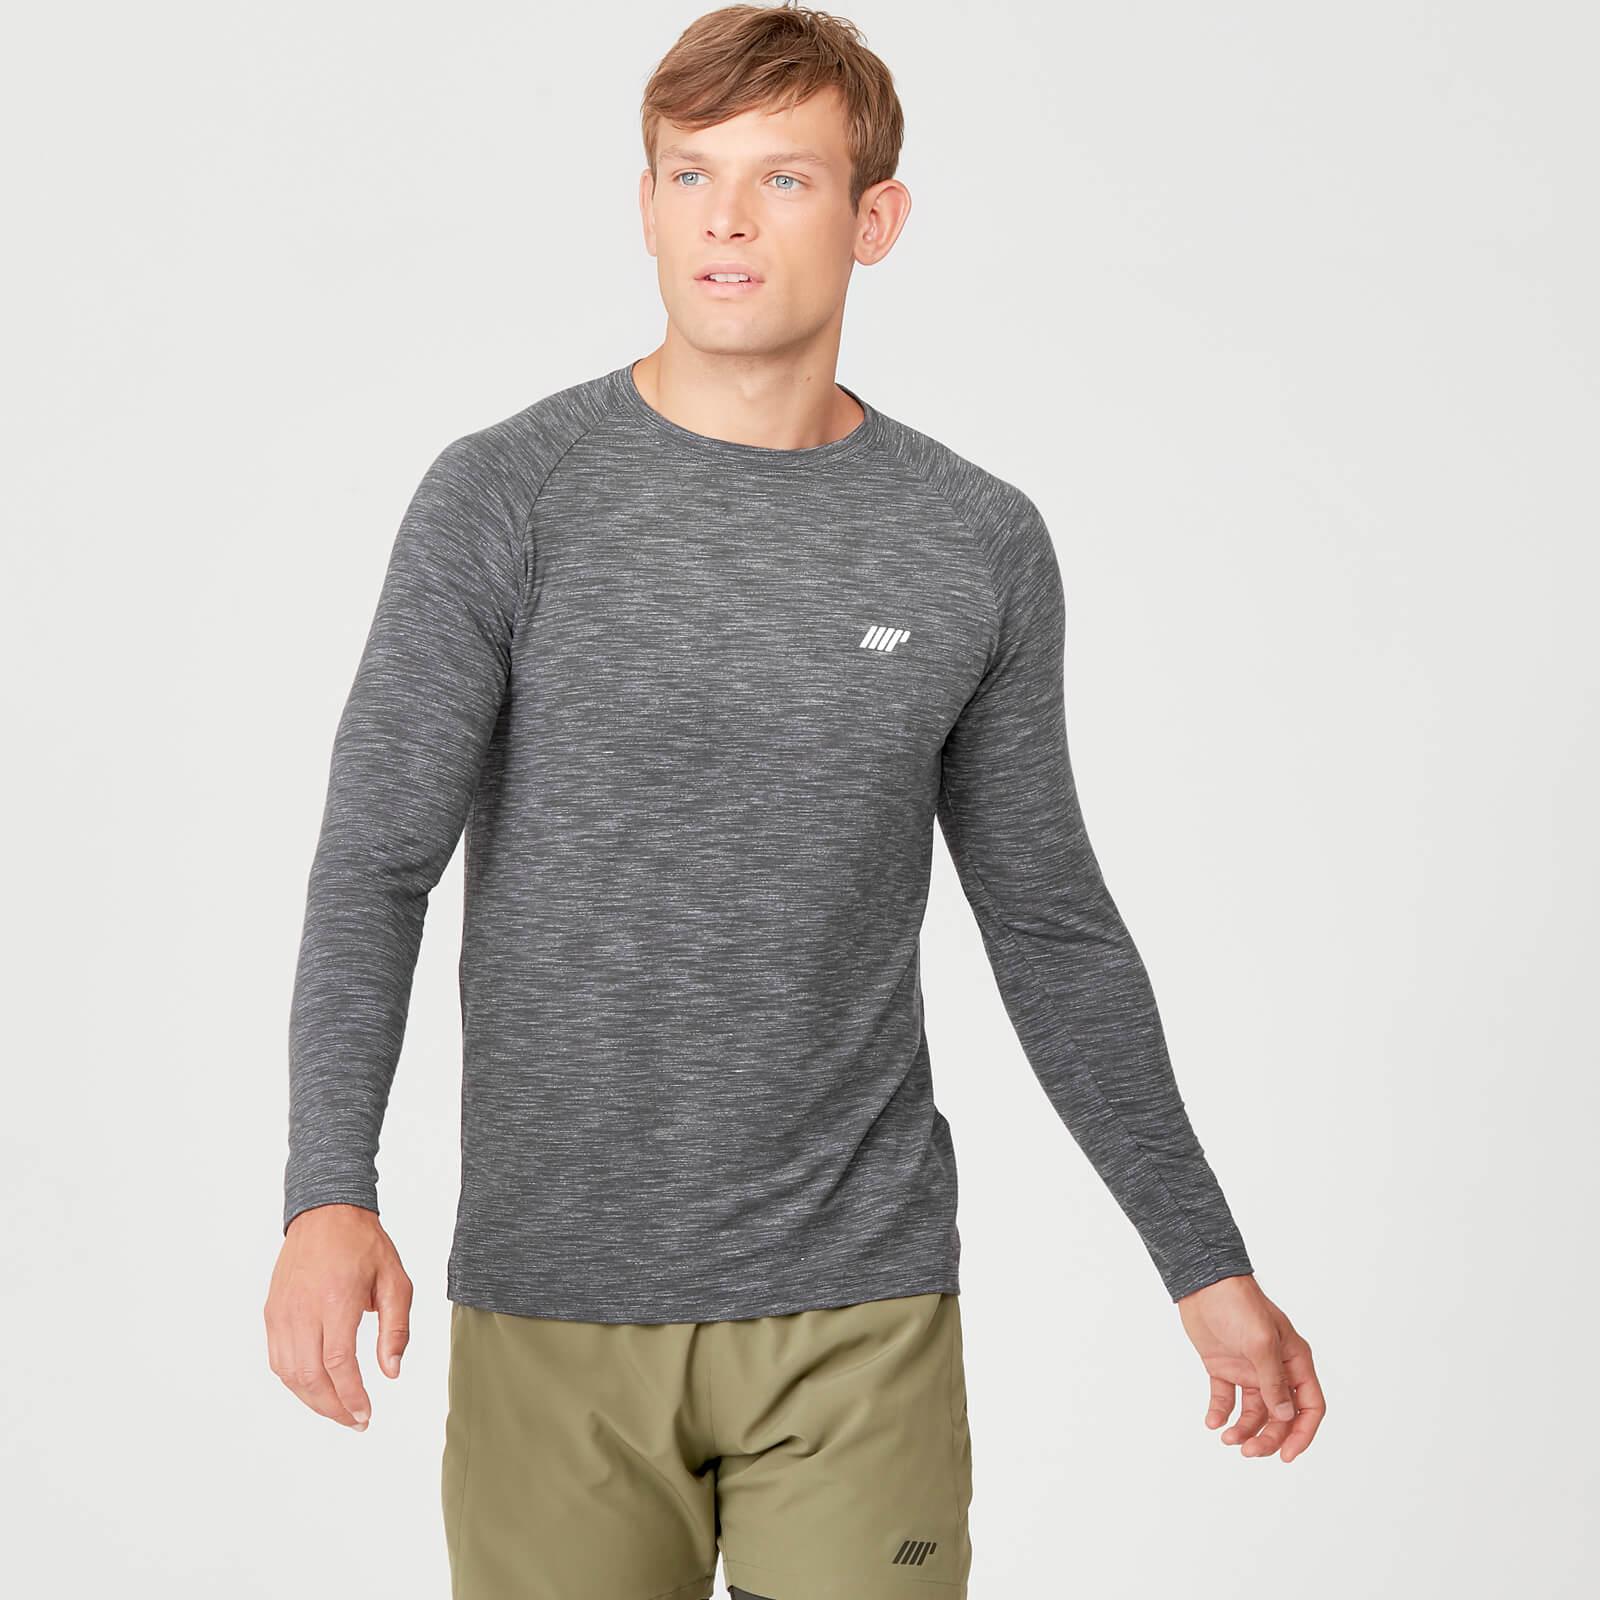 Myprotein Performance Long-Sleeve T-Shirt - Charcoal Marl - XXL